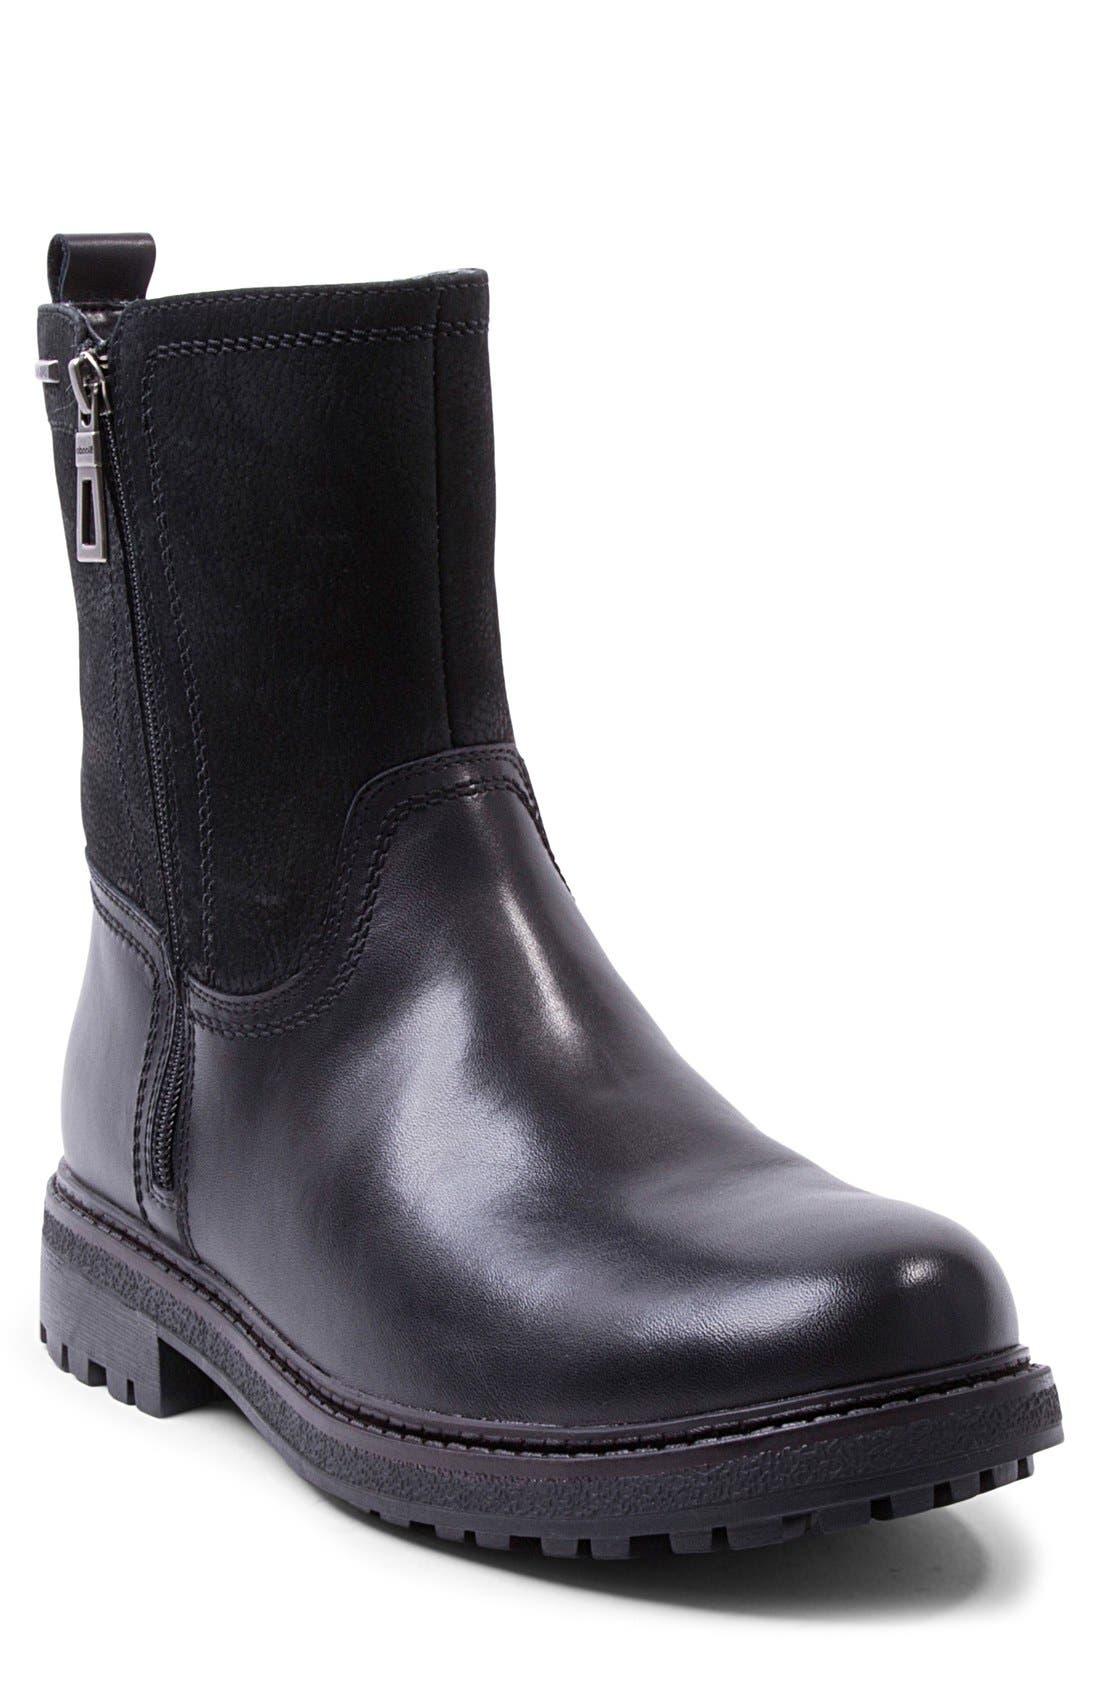 'Jagger' Waterproof Zip Boot,                             Main thumbnail 1, color,                             001